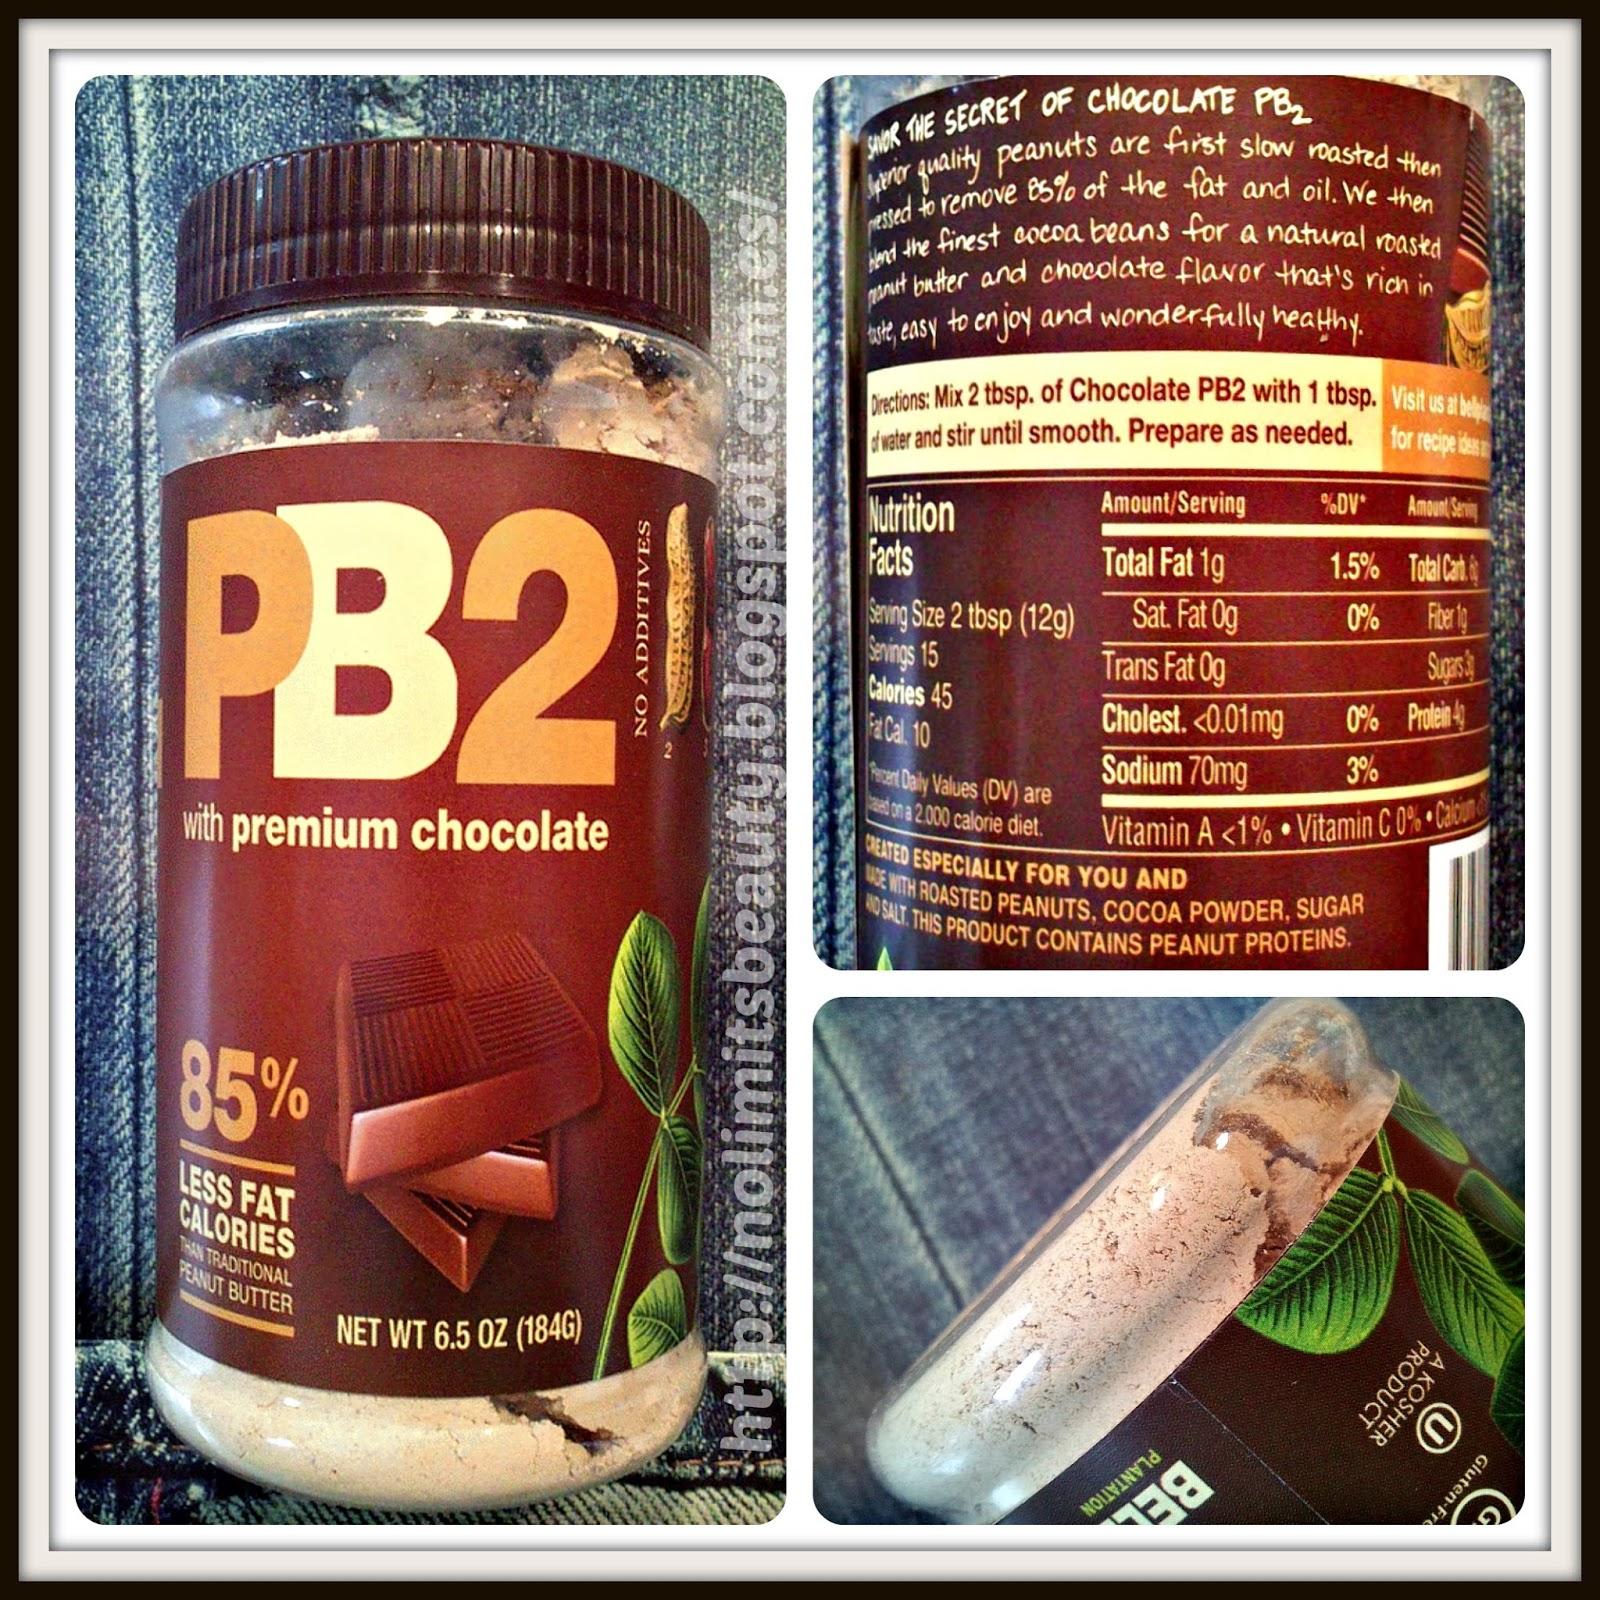 iHerb - PB2 with premium chocolate